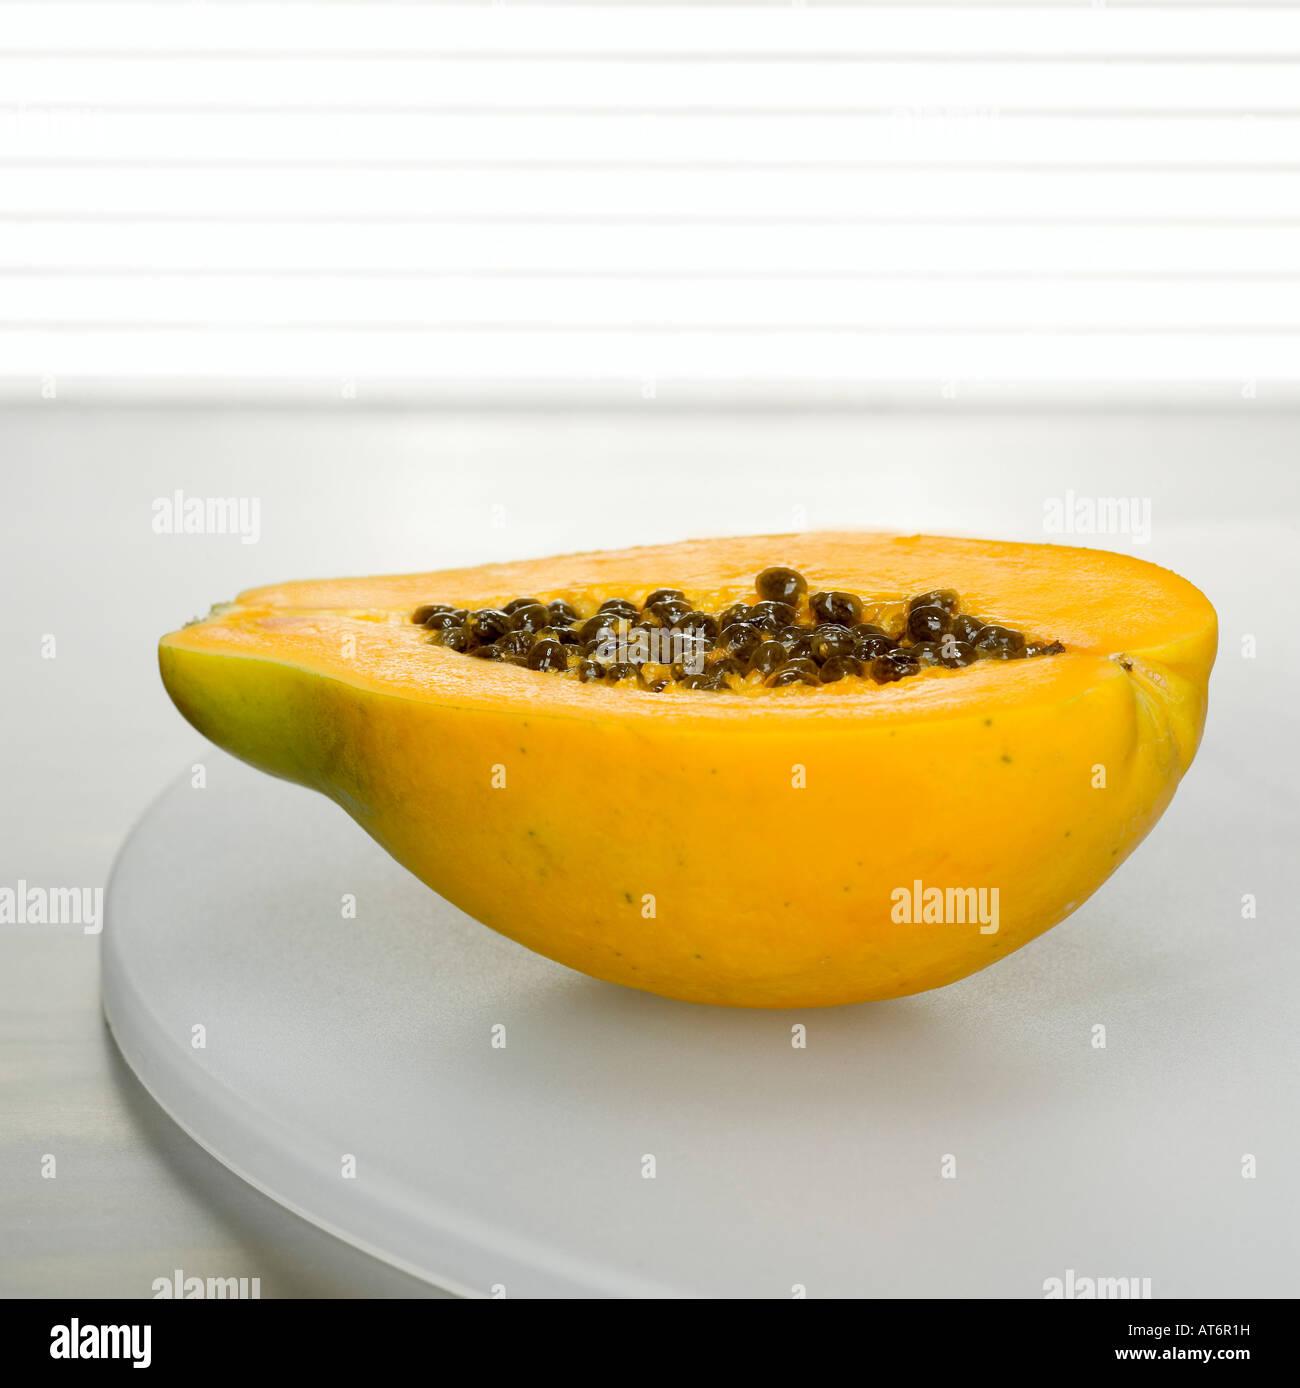 Sliced papaya on plate, close-up - Stock Image